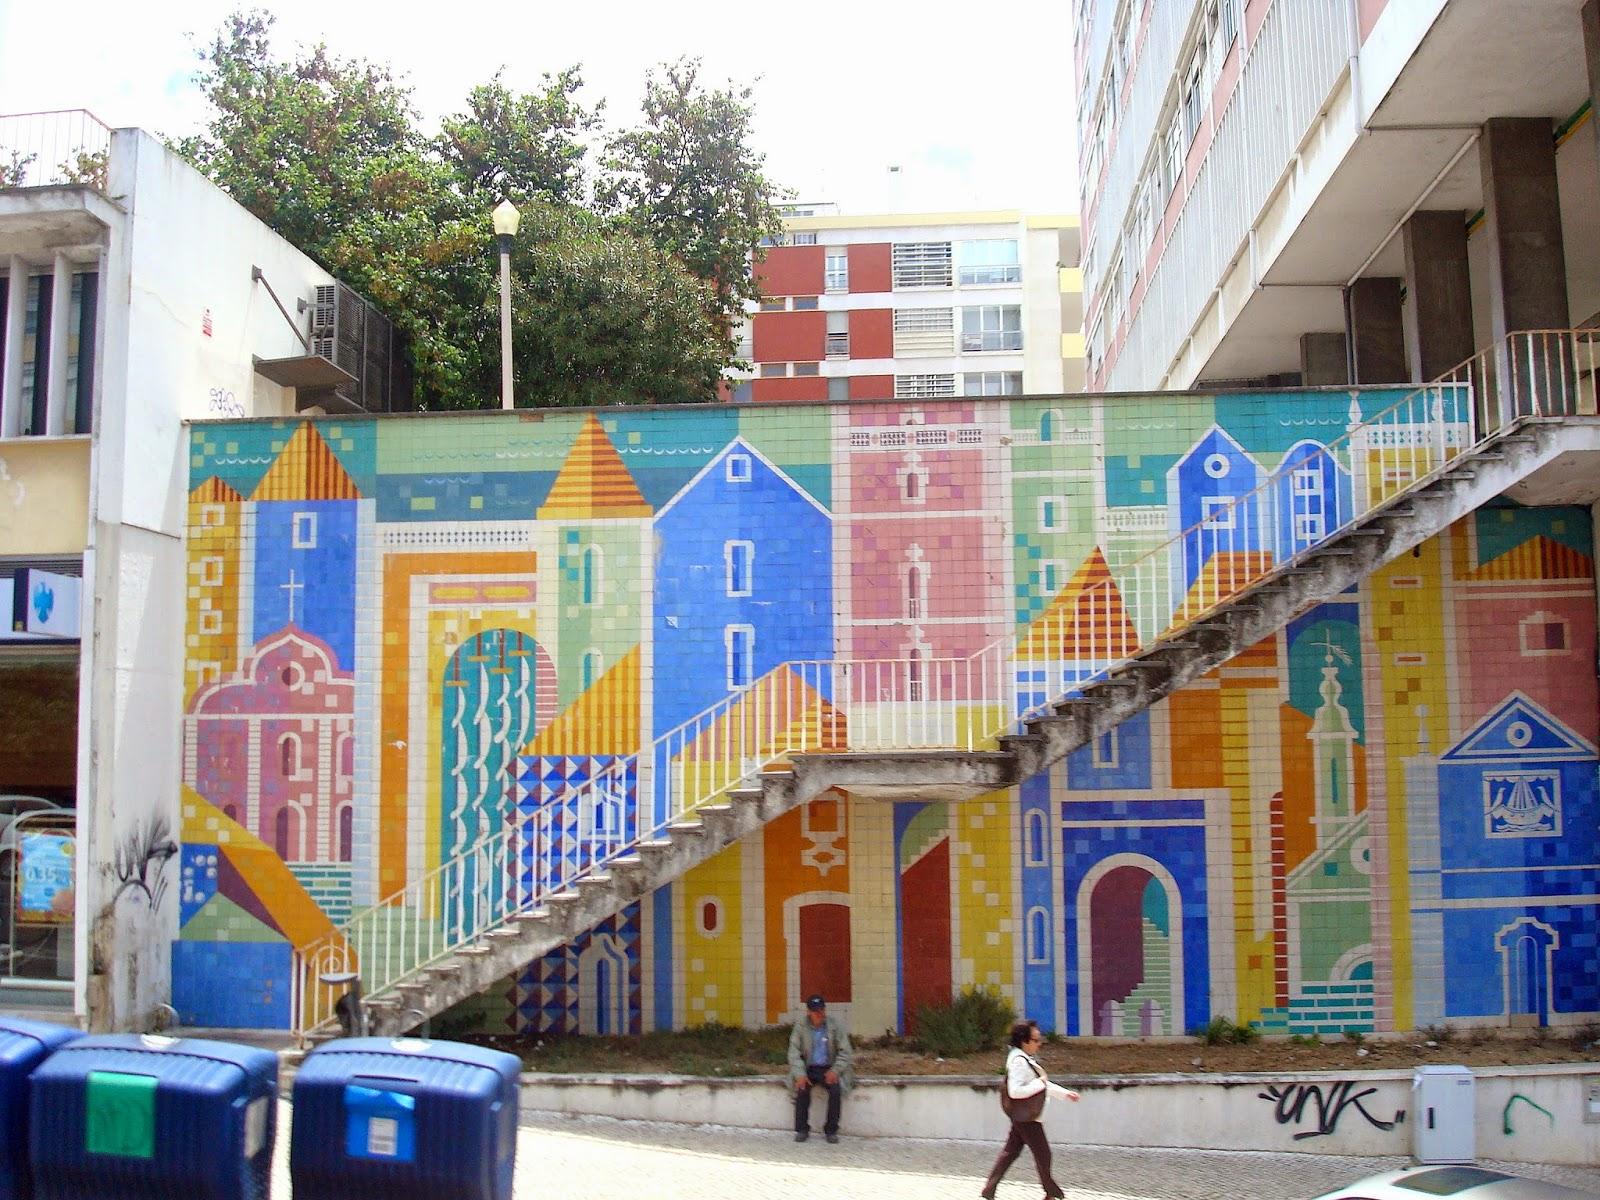 Azulejos, or Mosaic Tile Artwork in Lisbon, Portugal